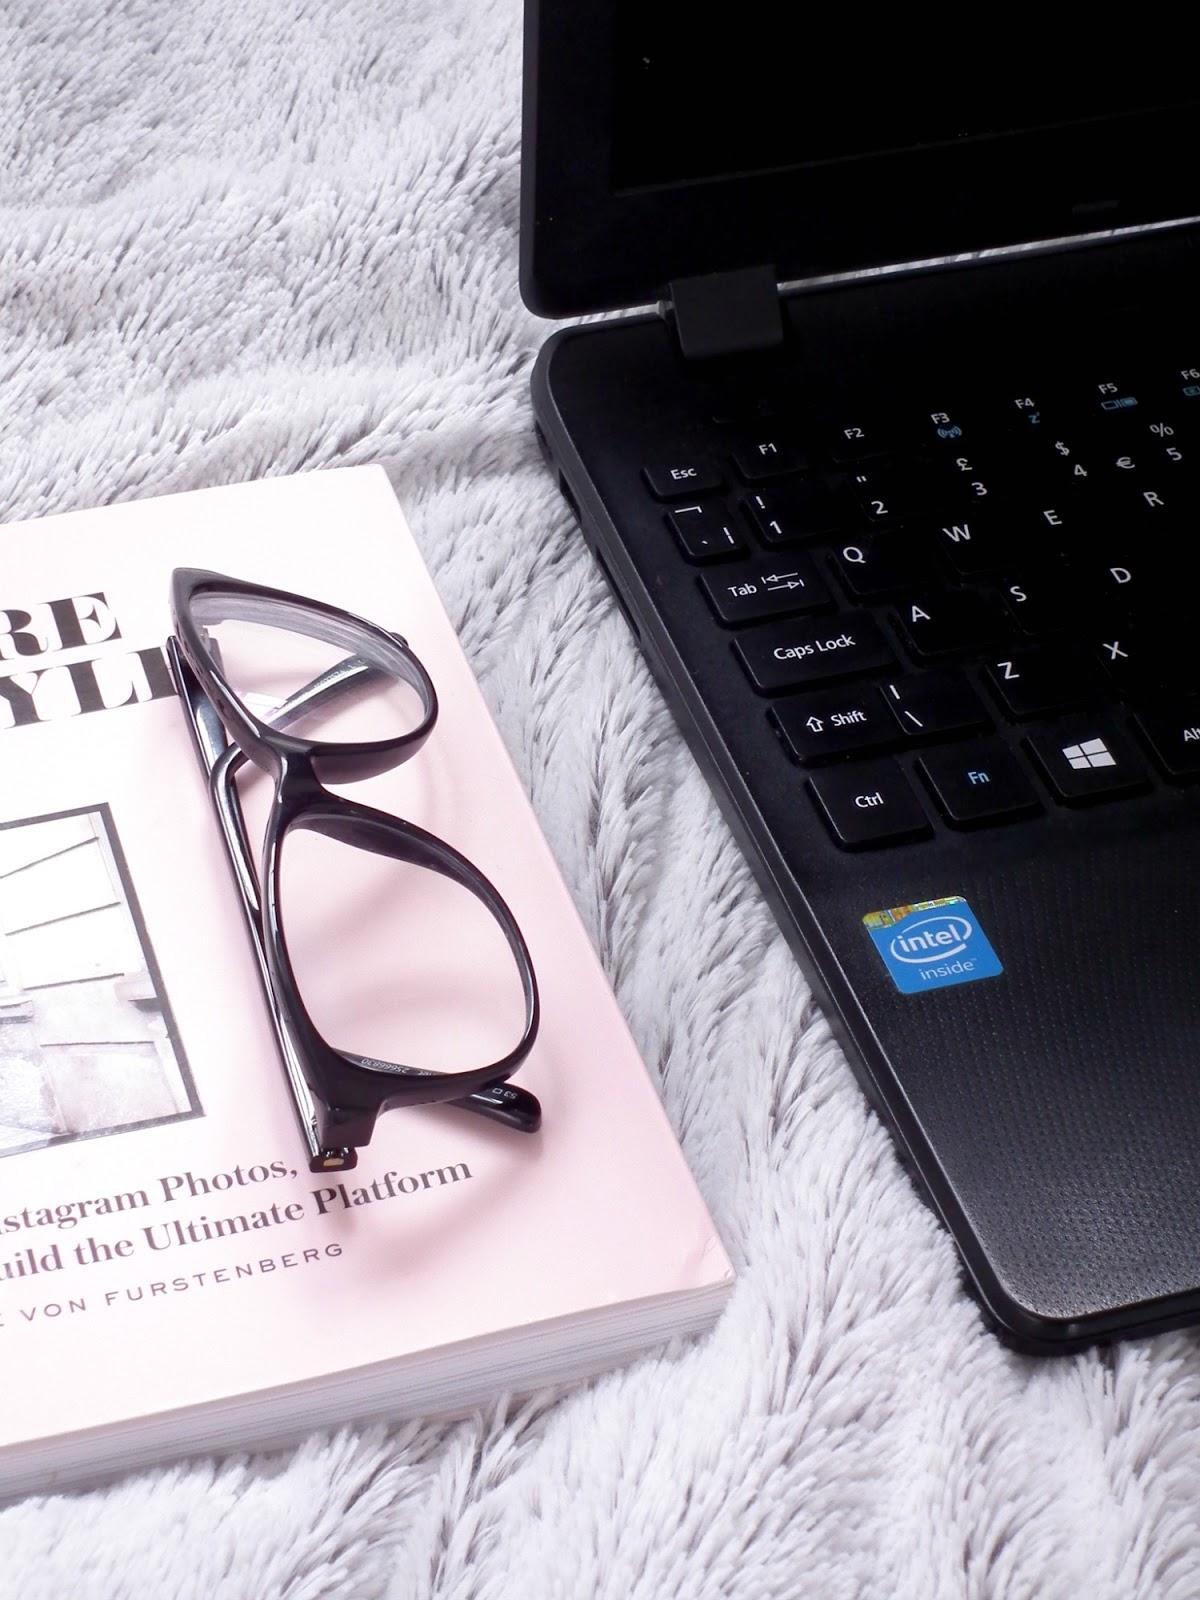 Why I've Never Kept My Blog A Secret